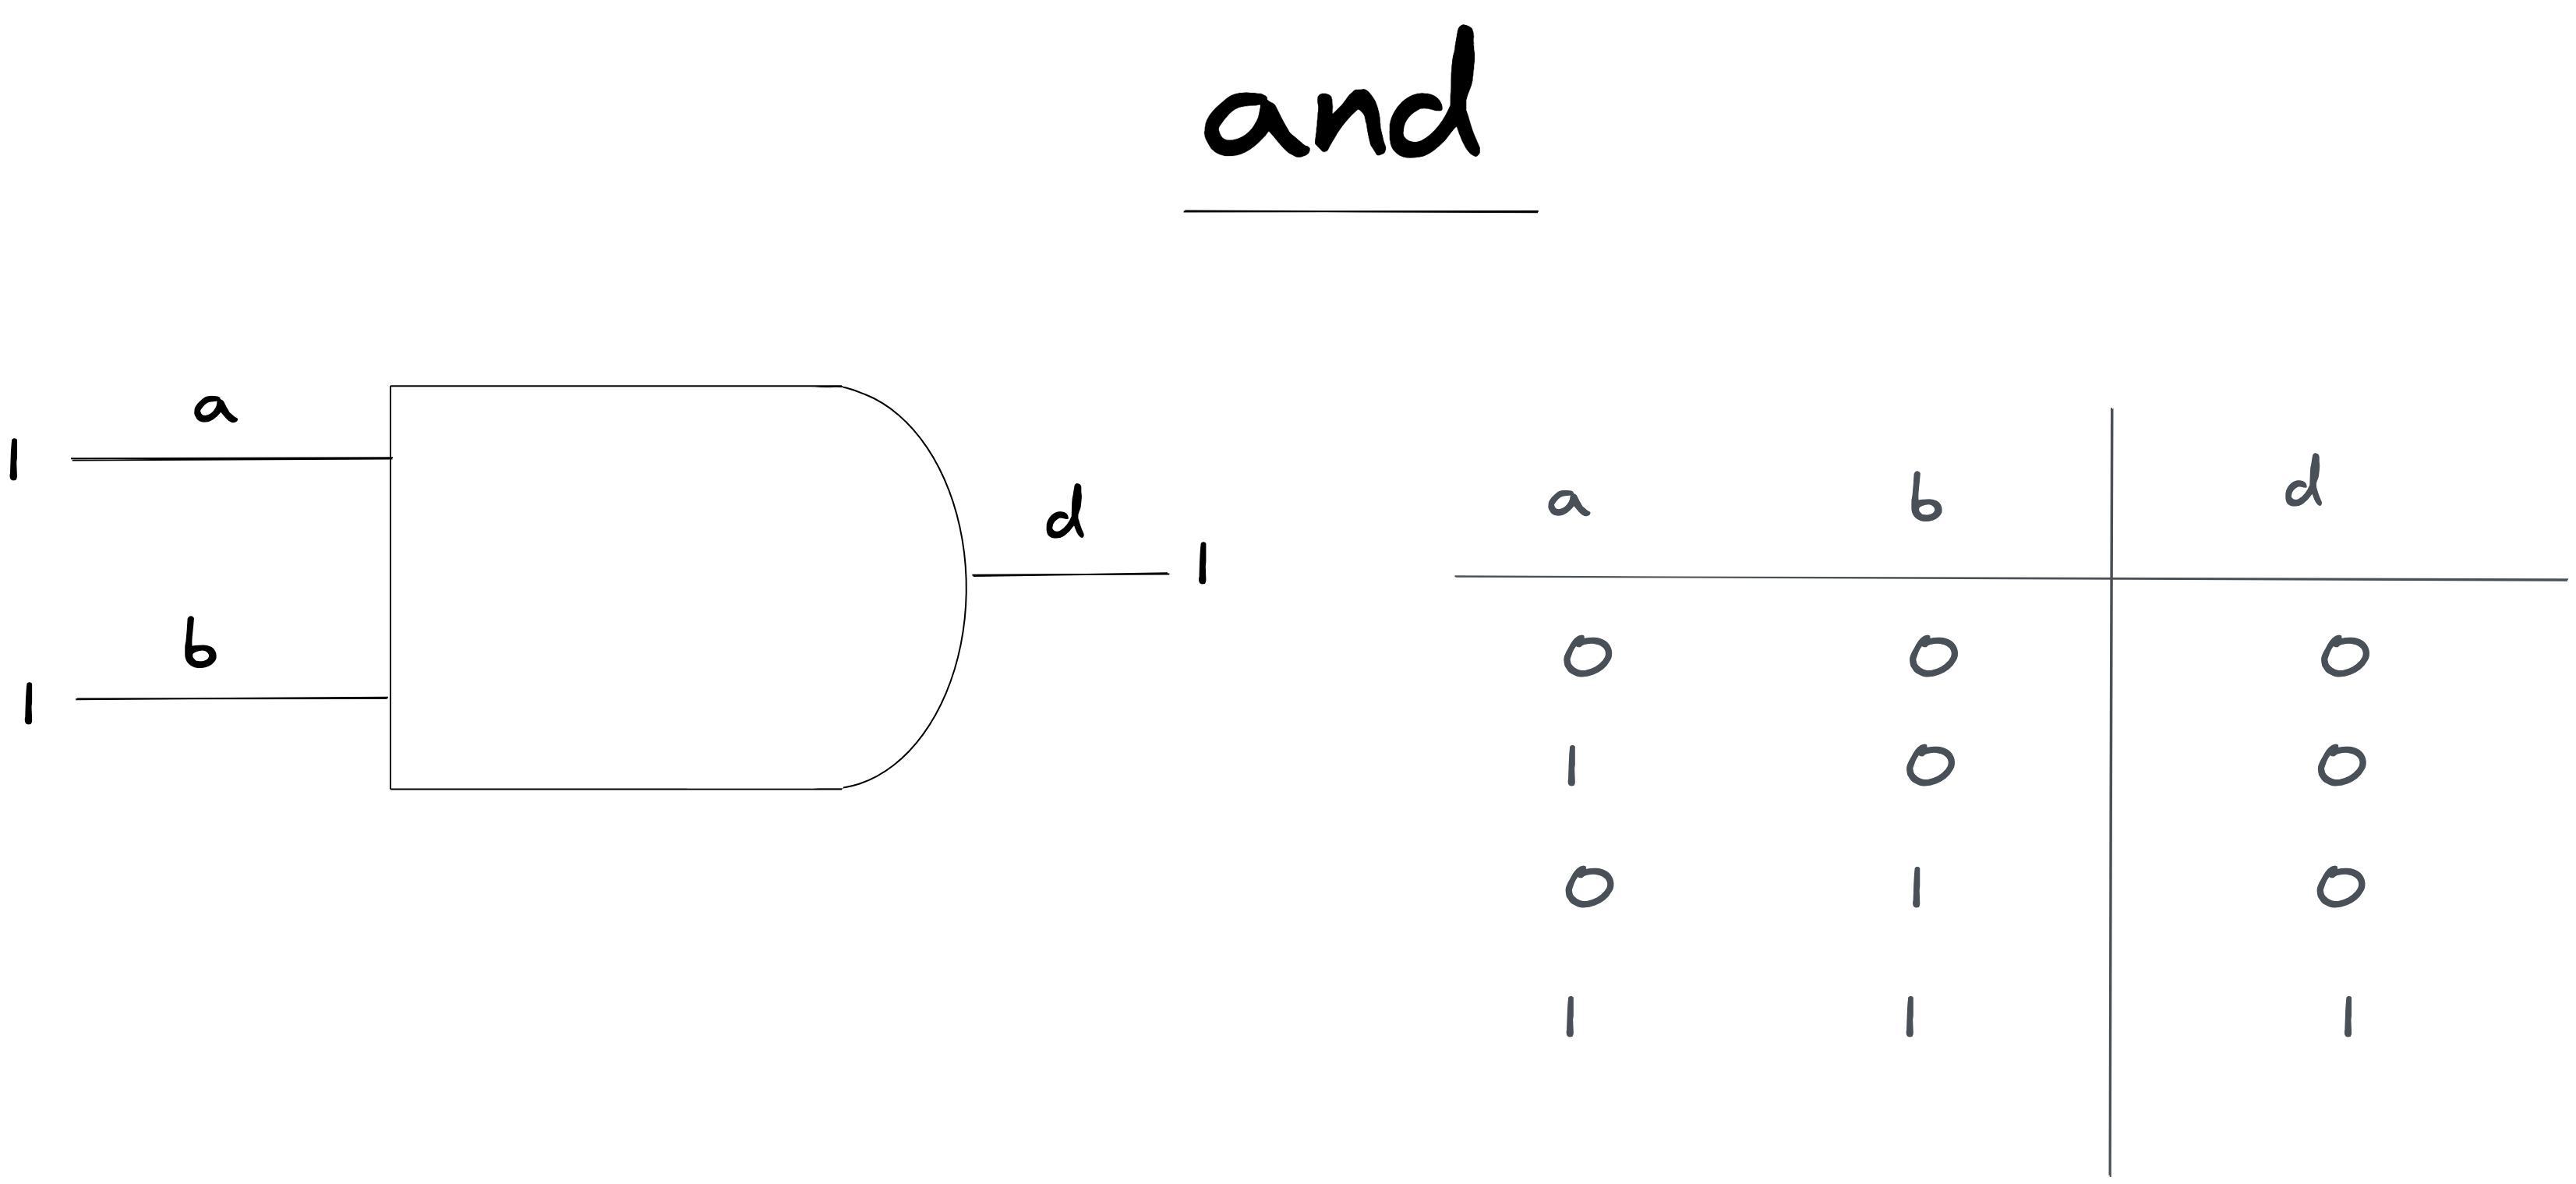 umair-akbar-aHR0cHM6Ly91c2VyLWltYWdlcy5naXRodWJ1c2VyY29udGVudC5jb20vOTg0NTc0Lzk1Nzc2NjU2LWJlMjg0MjAwLTBjOTItMTFlYi04N2Q2LTM0MTJhMDY4YWEyZS5wbmc - Simulating RAM in Clojure